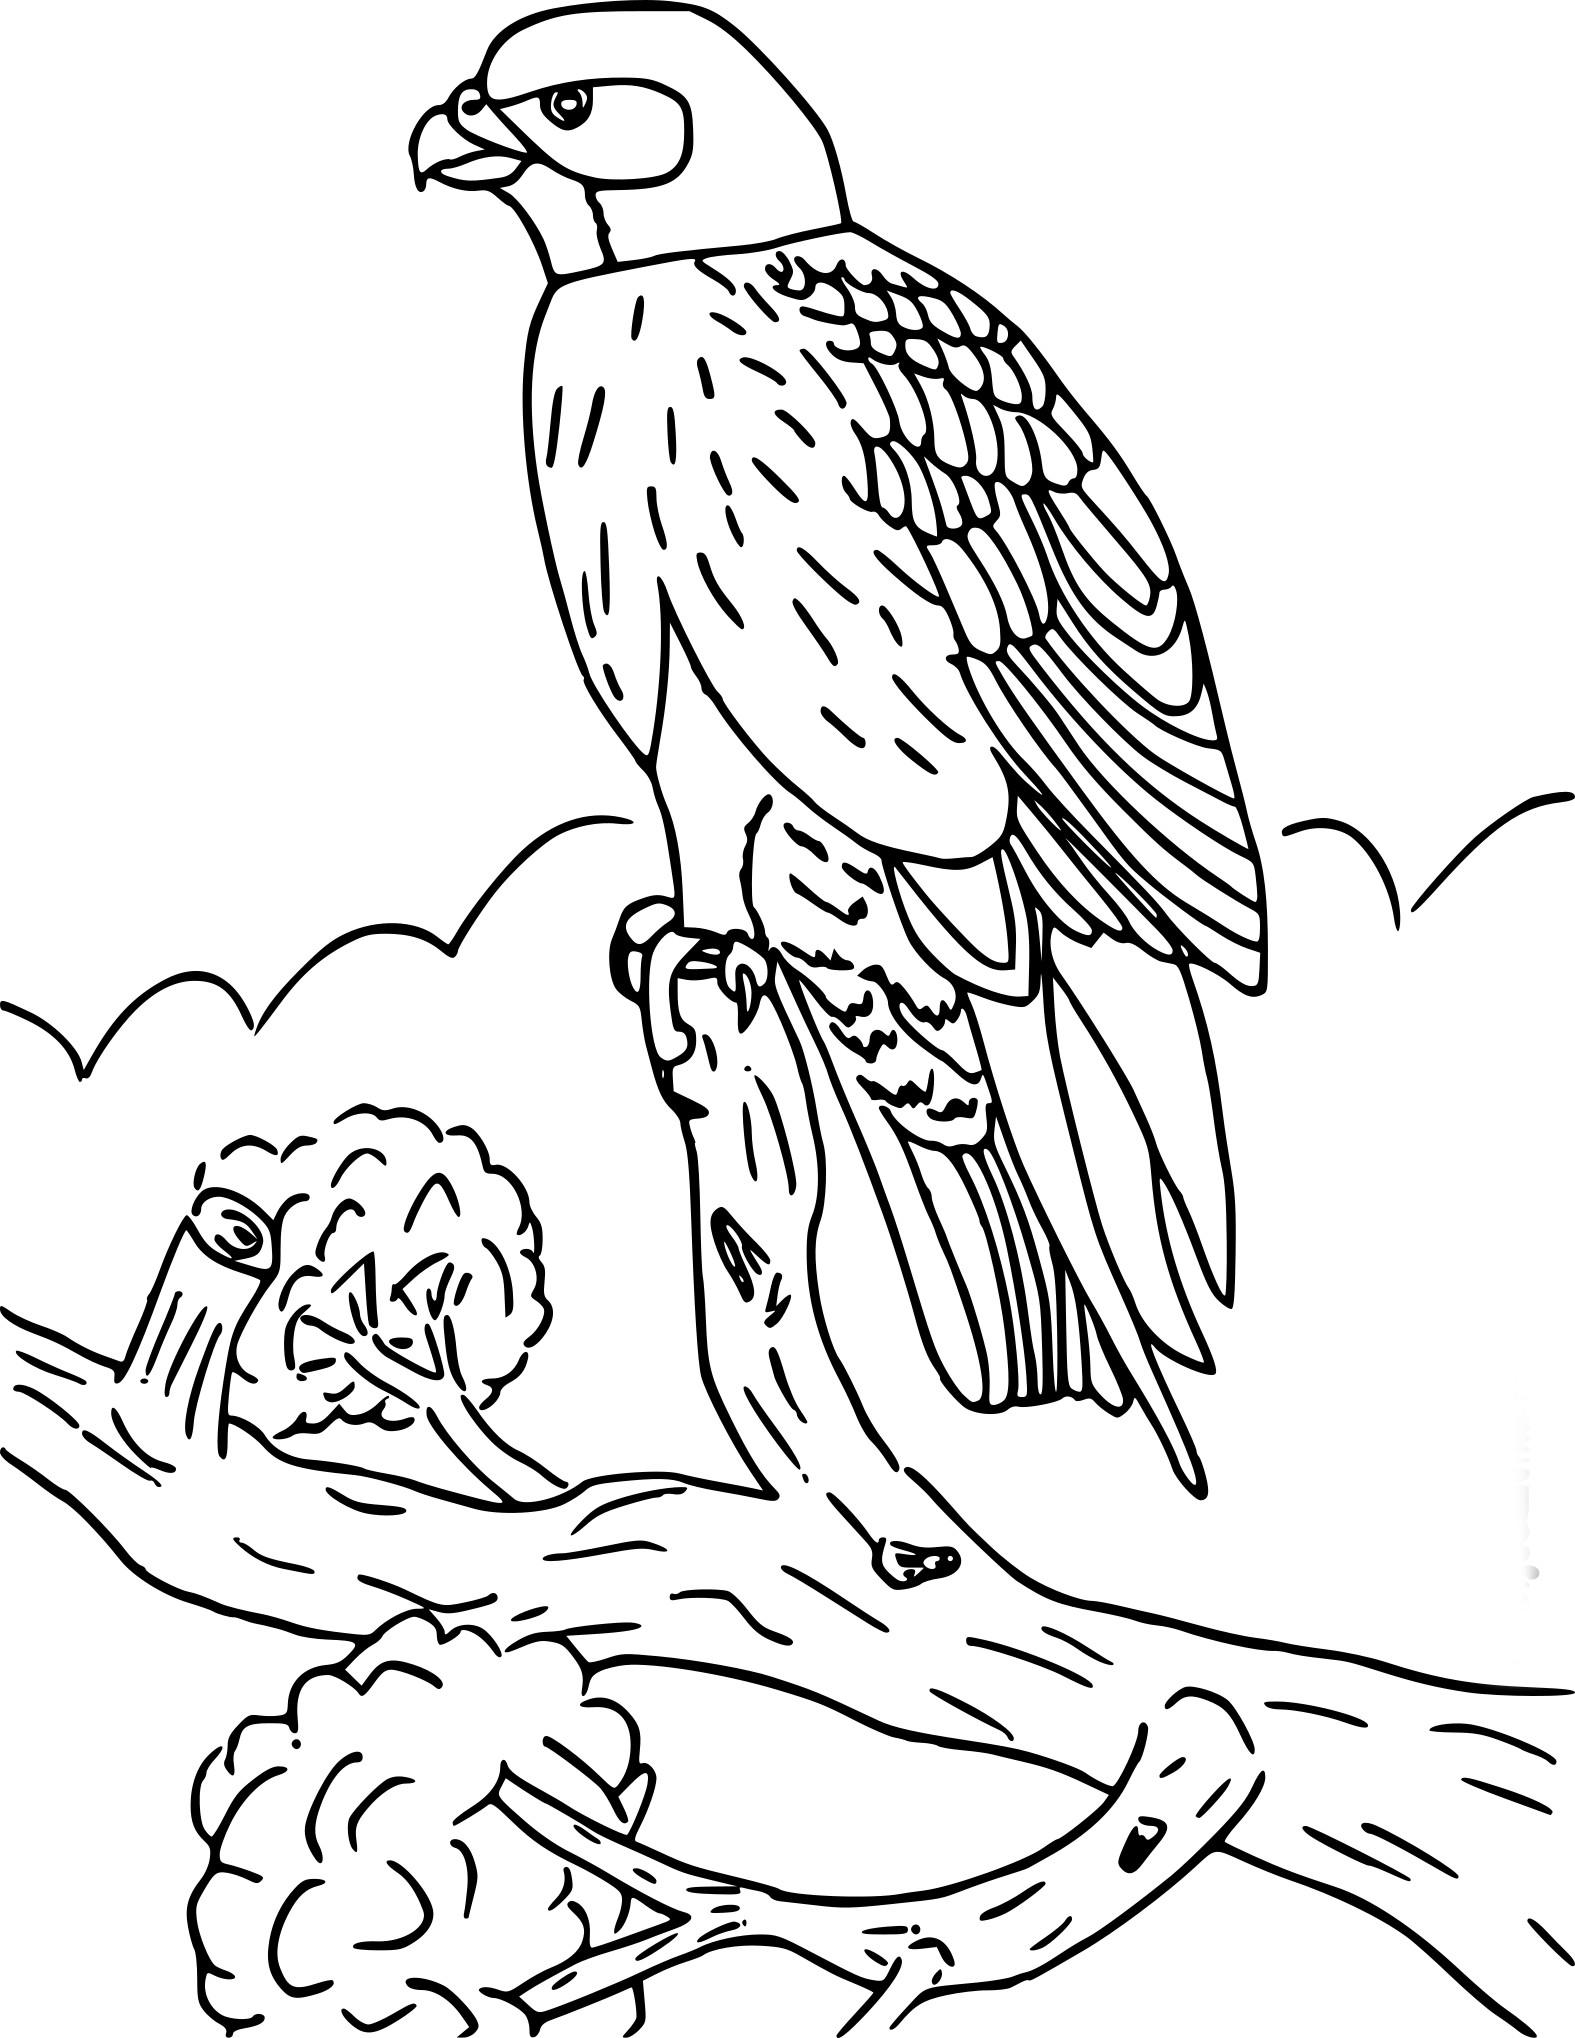 Faucon coloriage